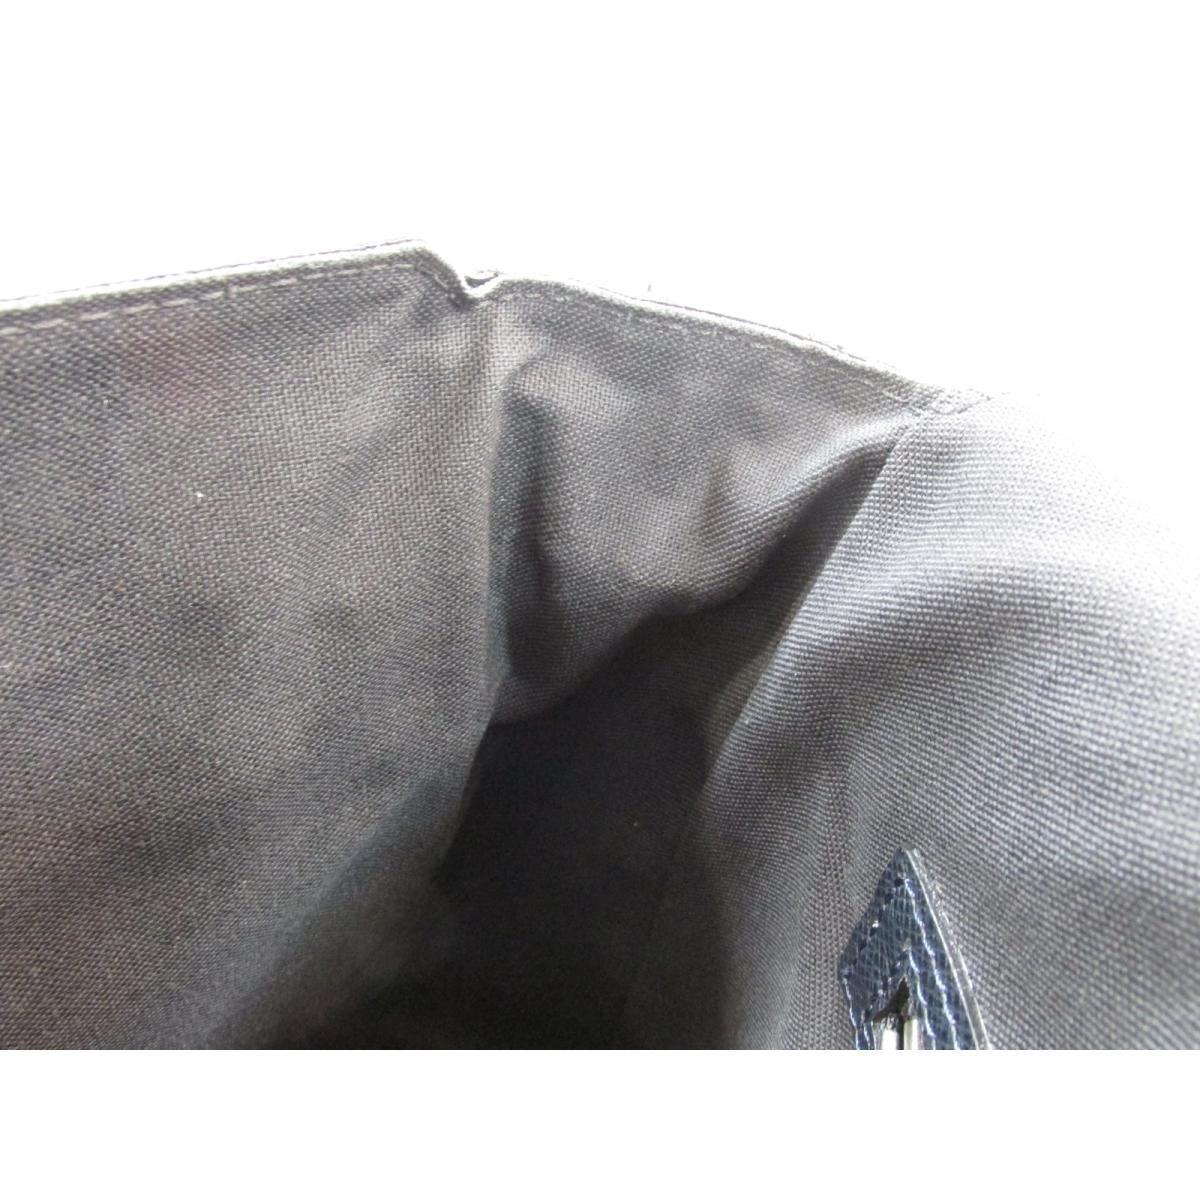 c7d5250acbaa Lyst - Louis Vuitton Auth Romain Mm Shoulder Crossbody Bag M32624 ...